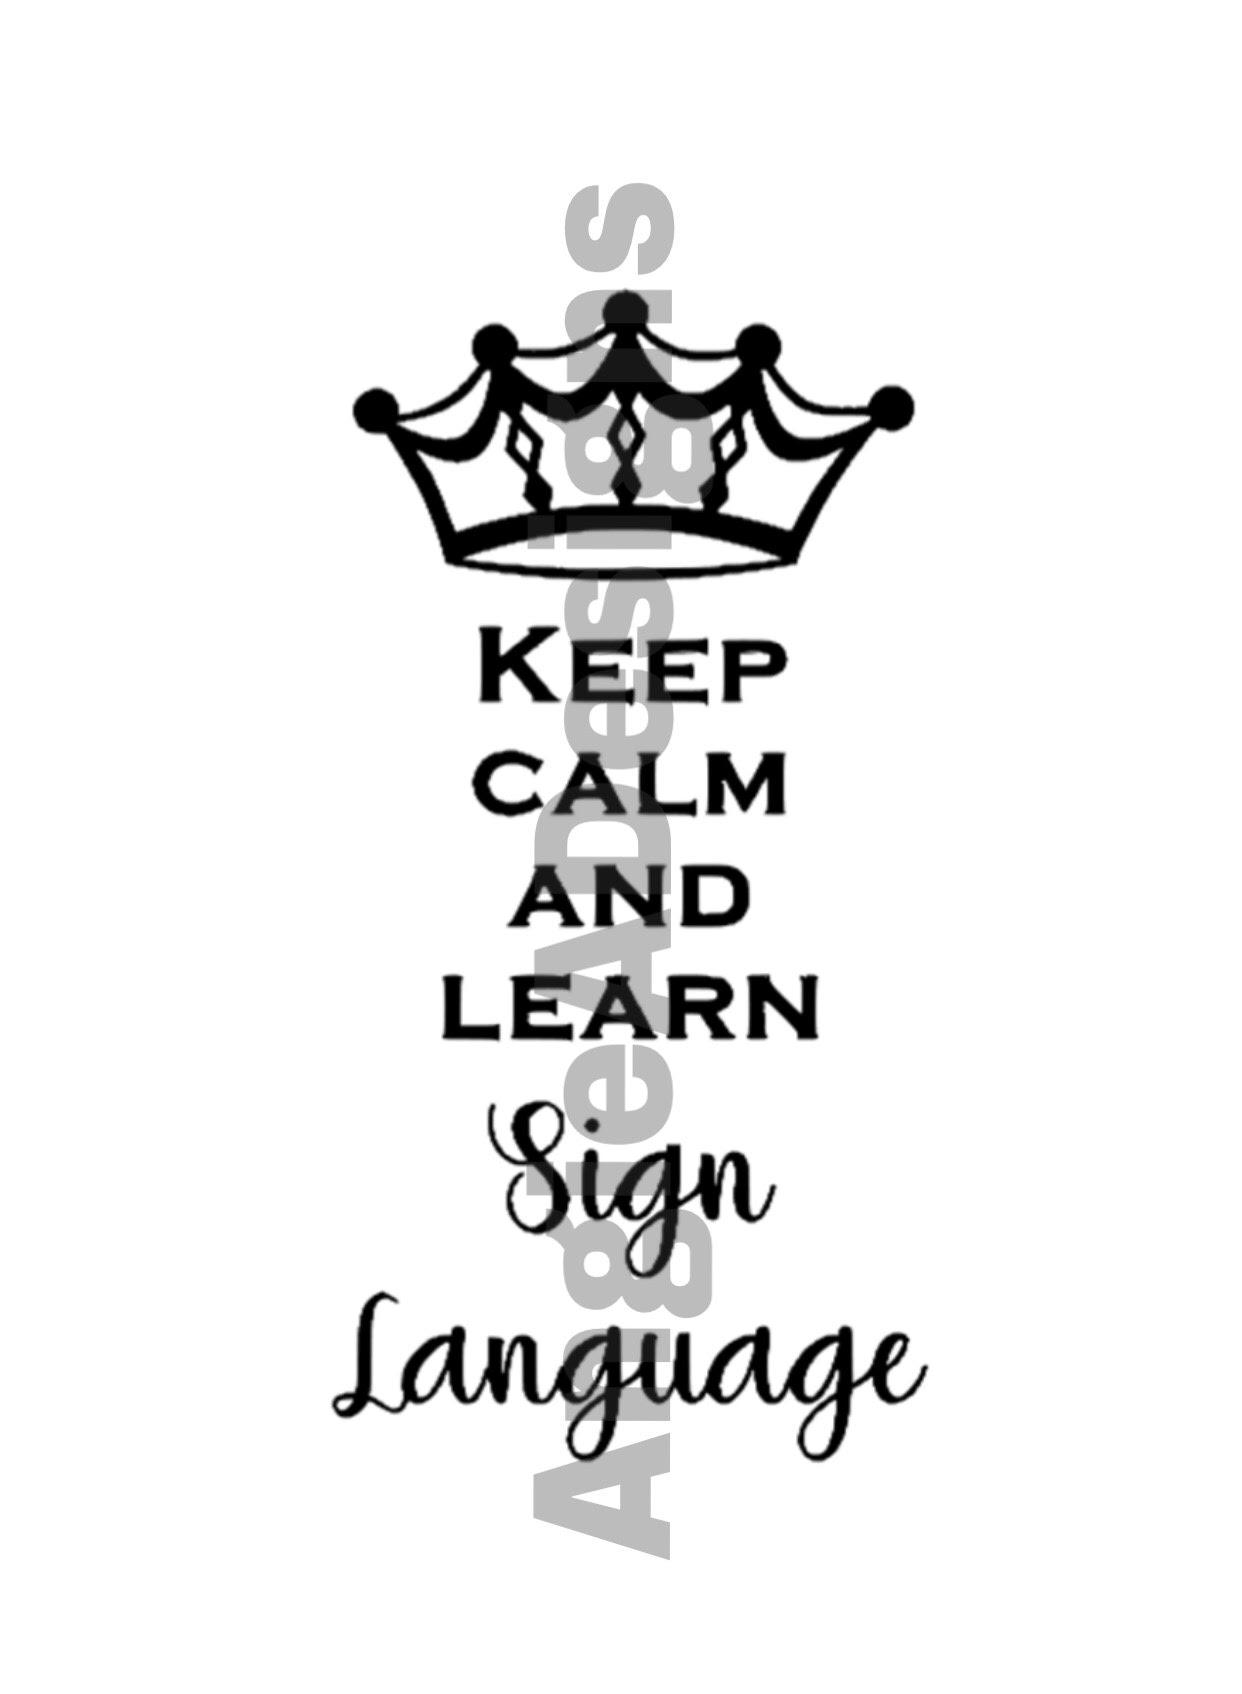 Keep Calm - Sign Language example image 1